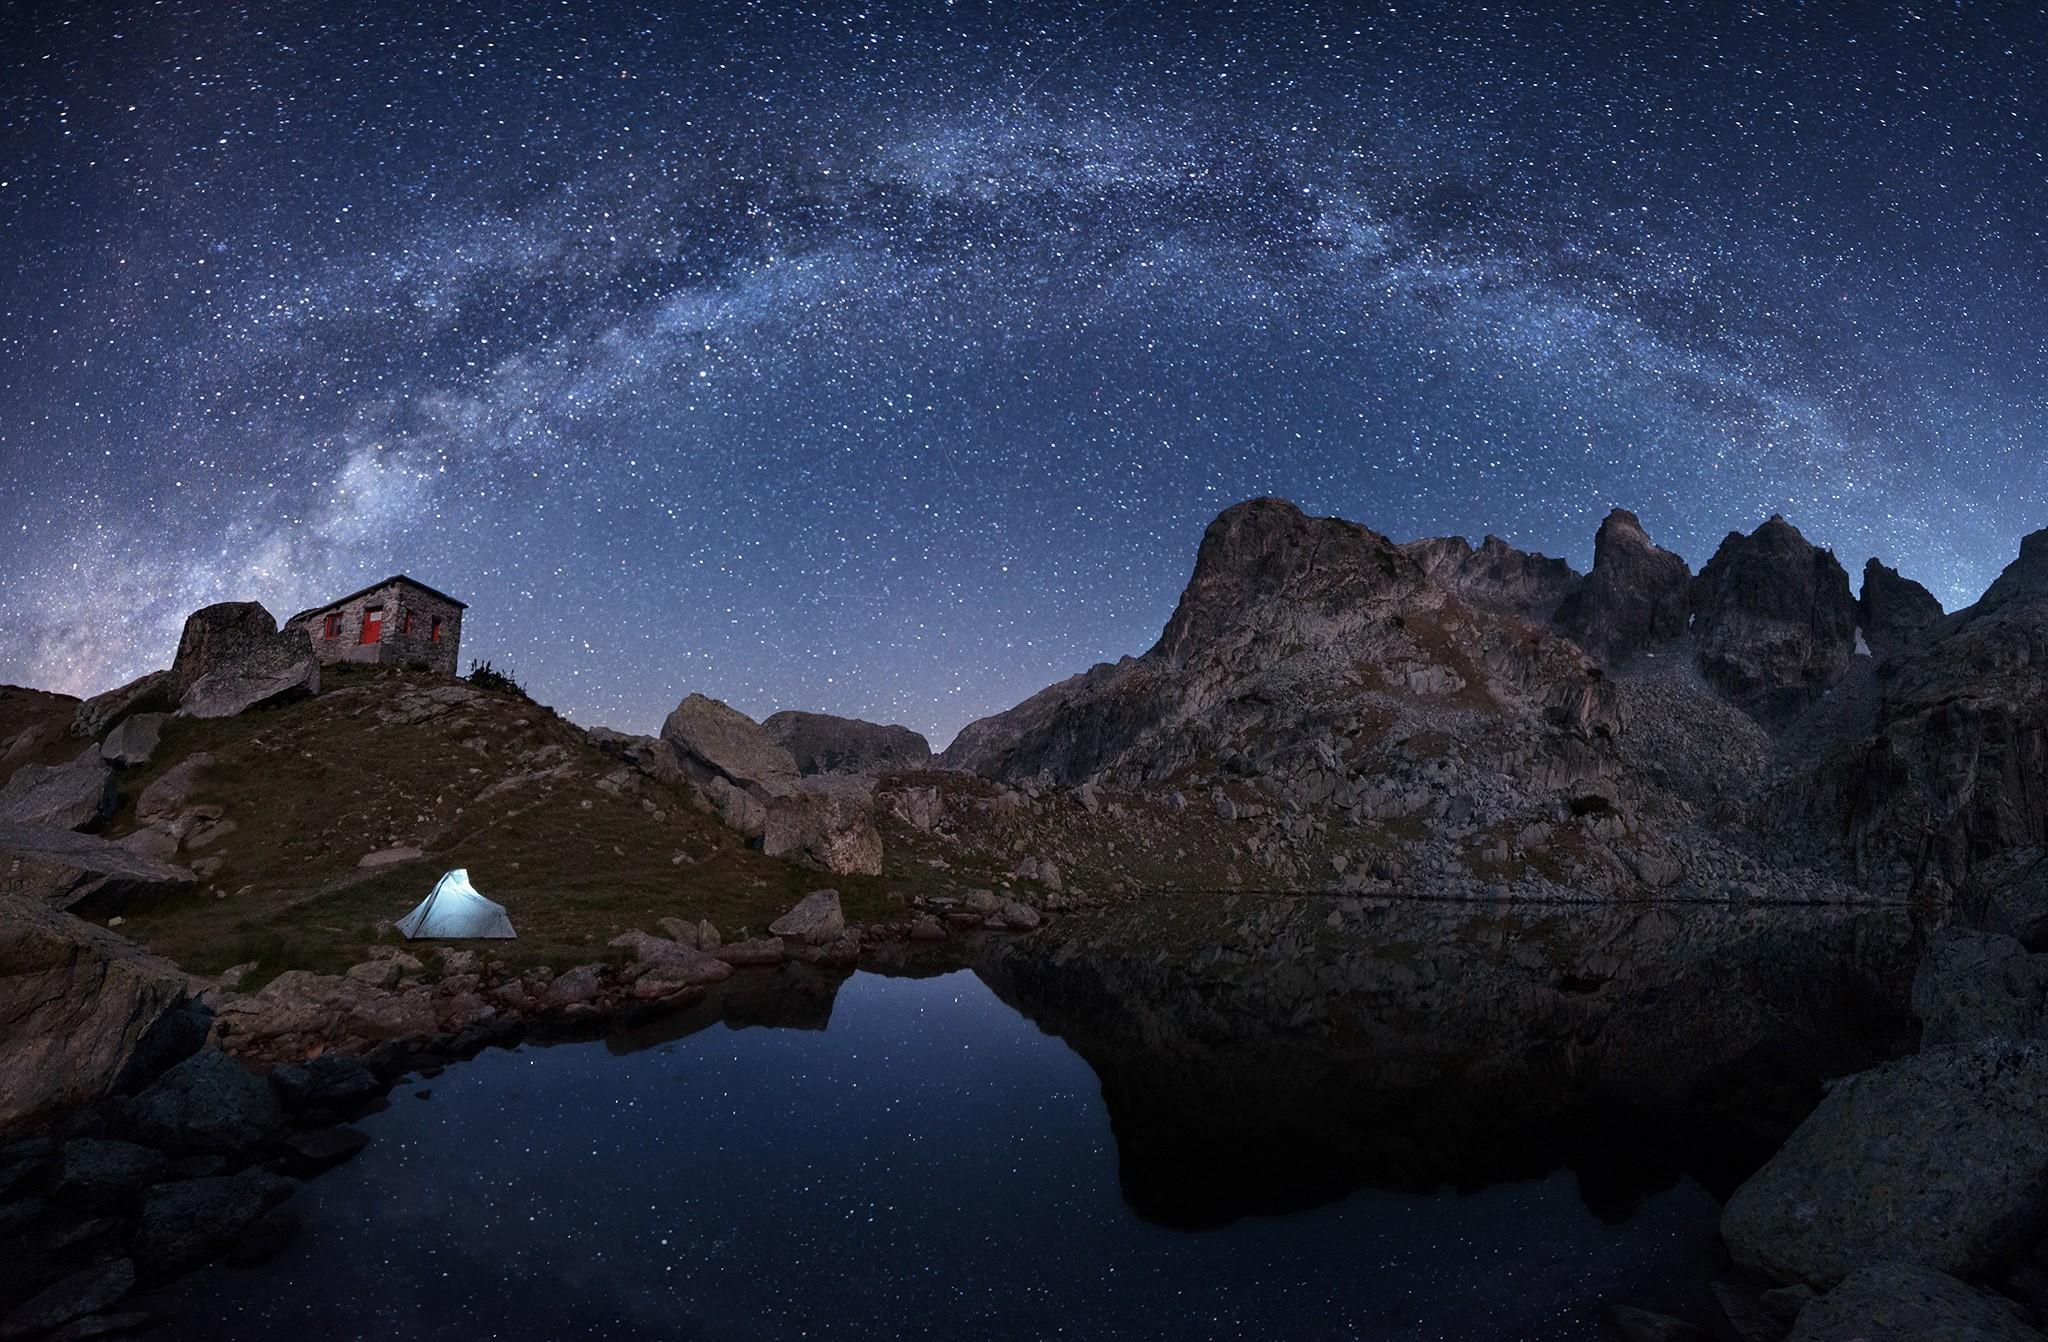 nature Night Stars Milky Way Landscape Mountain Rock House